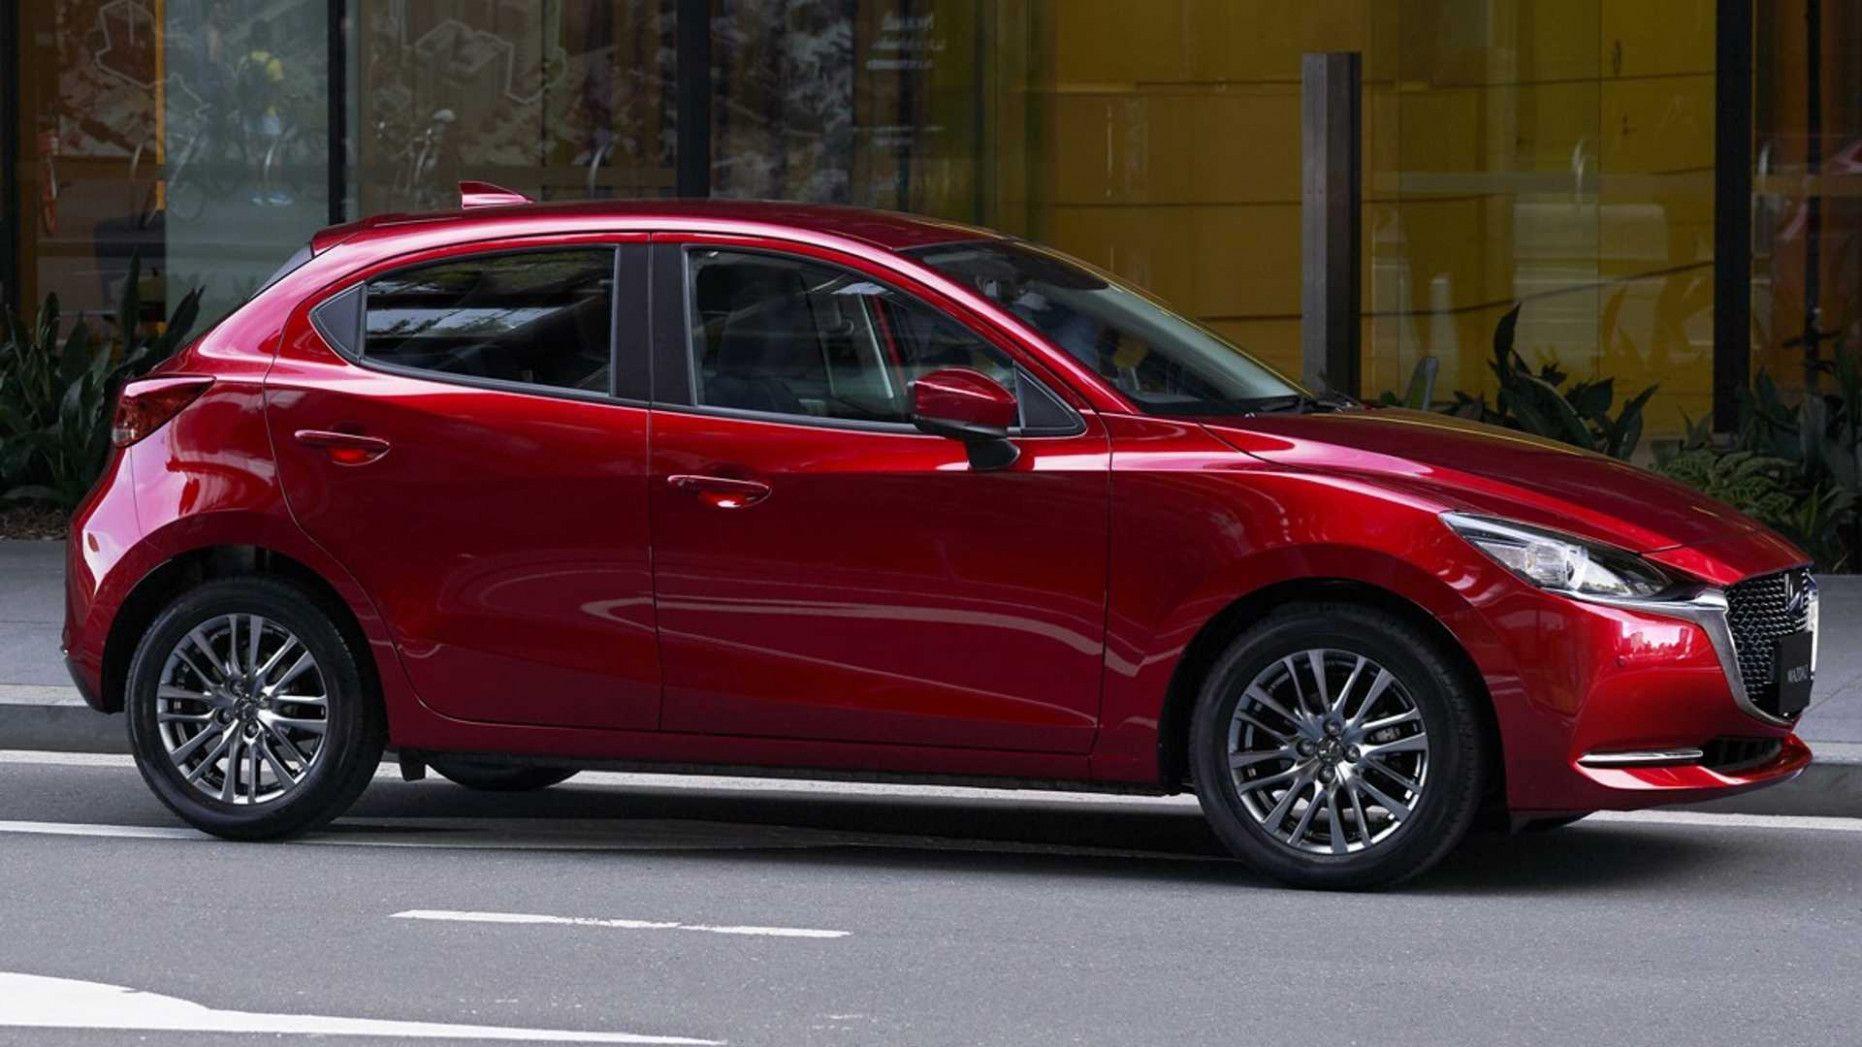 Mazda 2 Hatchback 2020 Performance And New Engine In 2020 Mazda Affordable Sports Cars Mazda 2